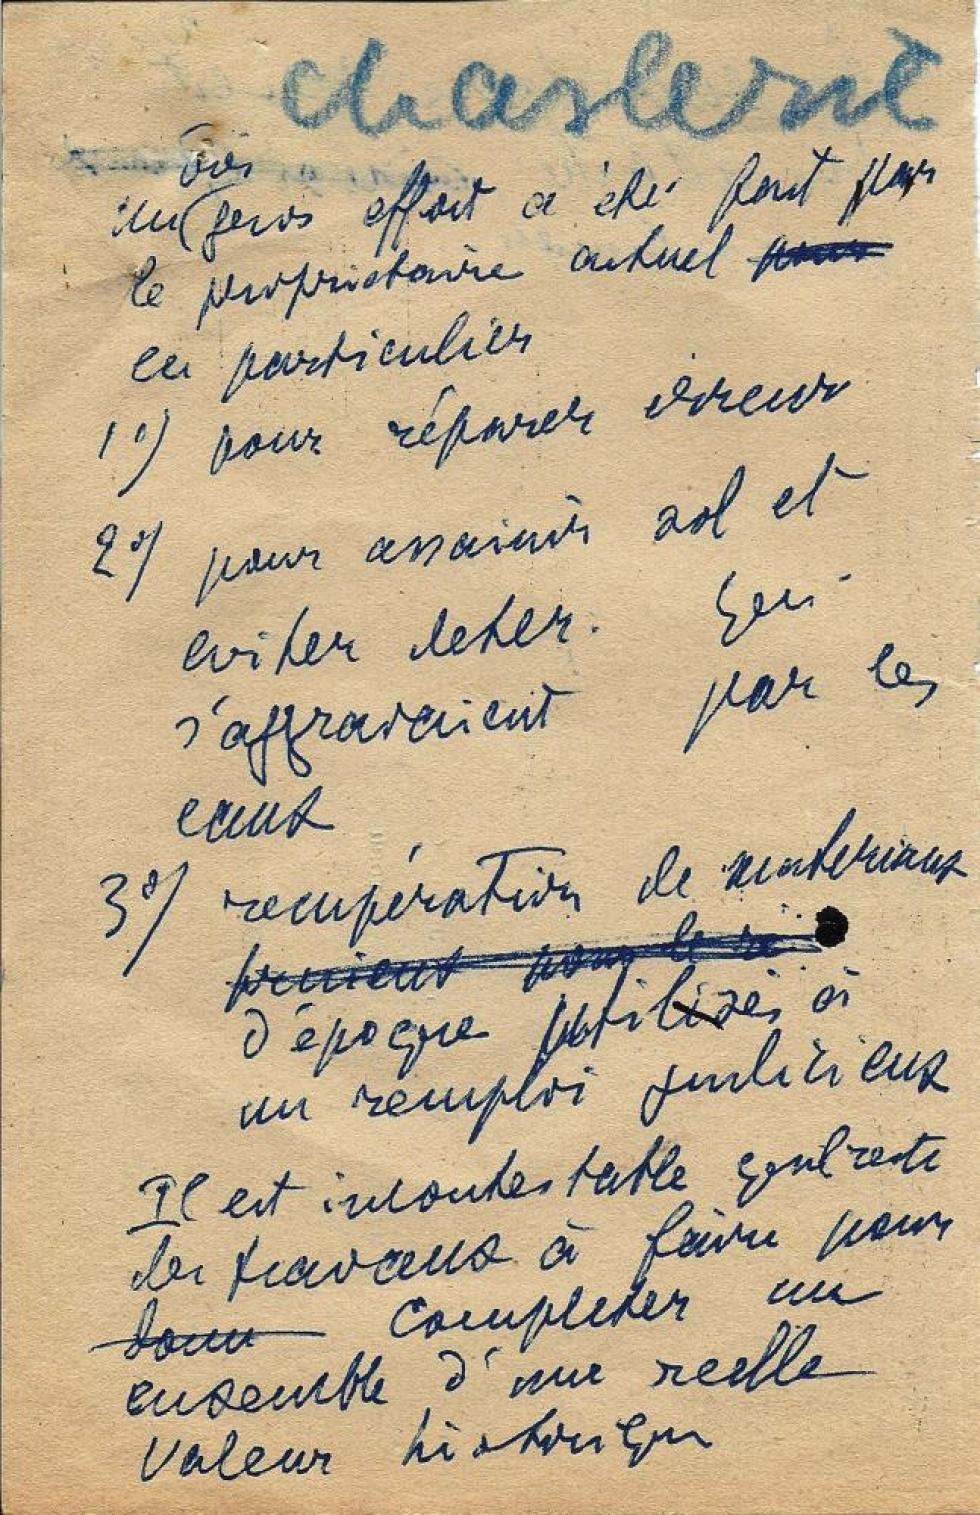 Brouillon d'Henti LEVEQUE, recto de la 1ère page.